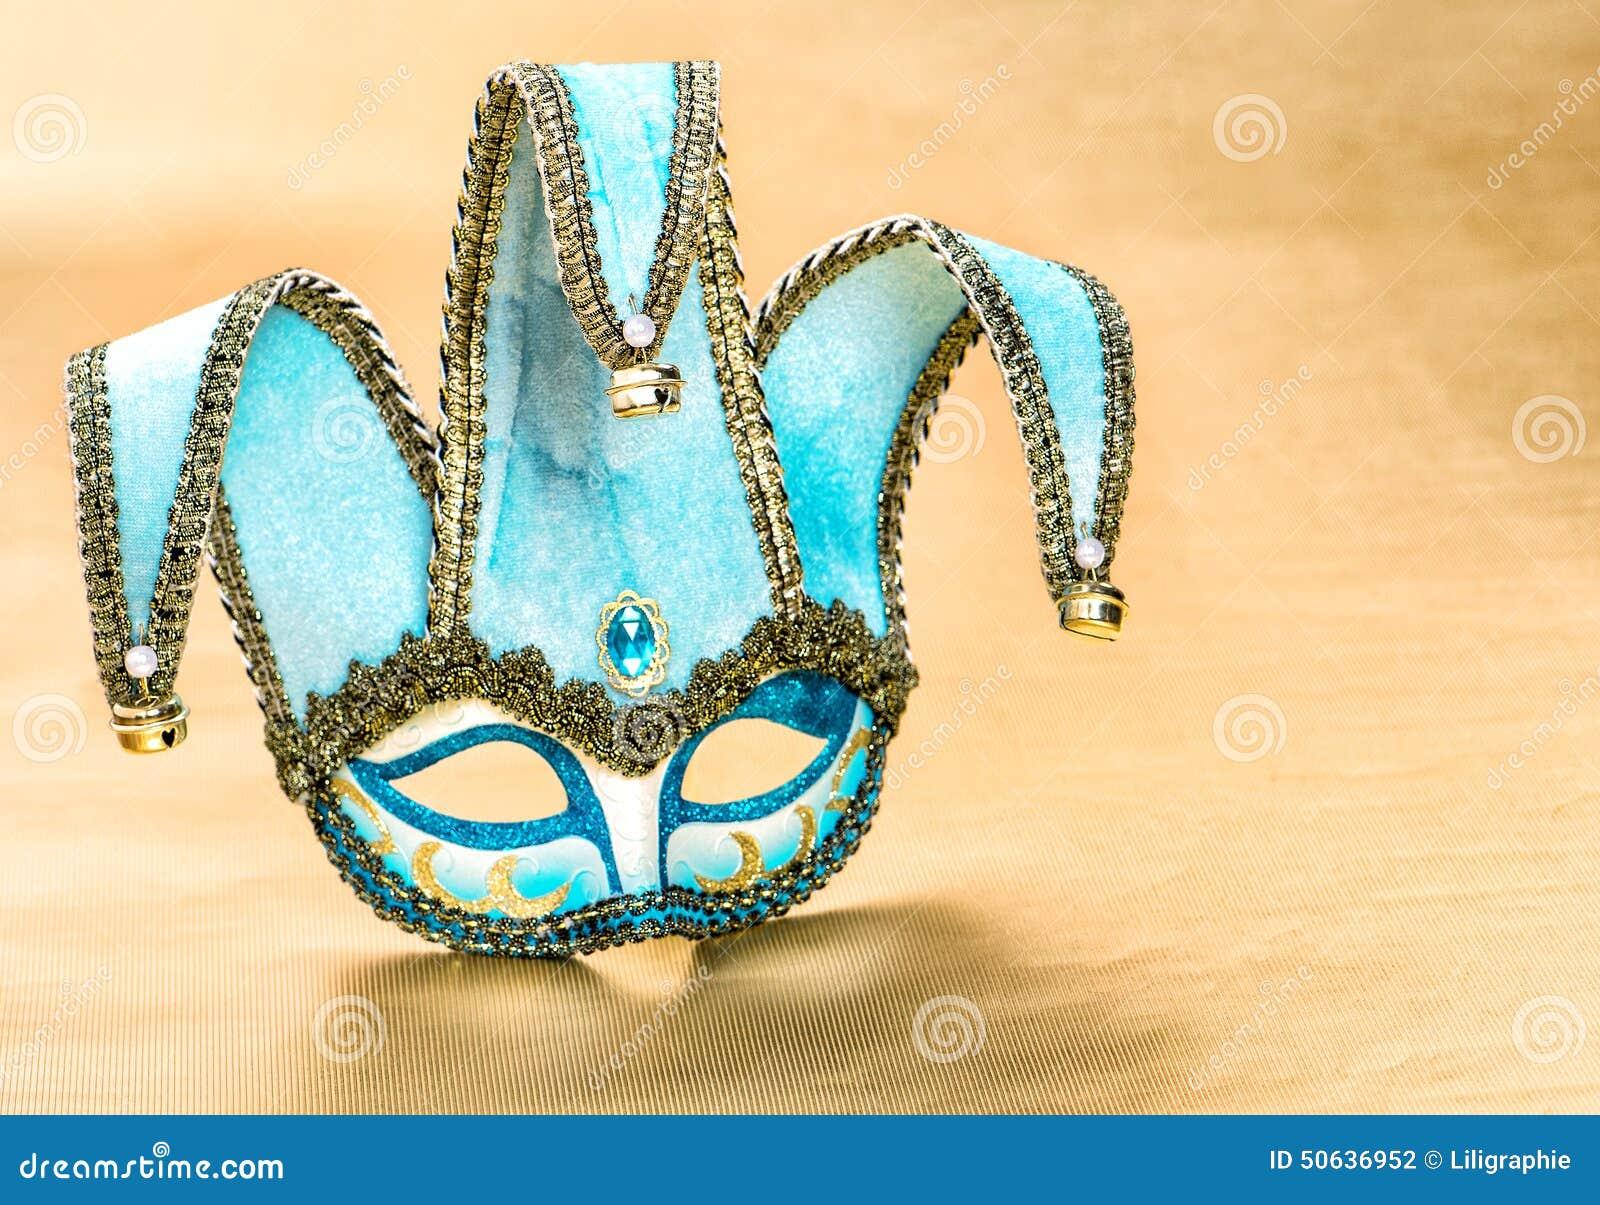 Harlequin v nitien de masque de carnaval d coration de - Masque venitien decoration ...